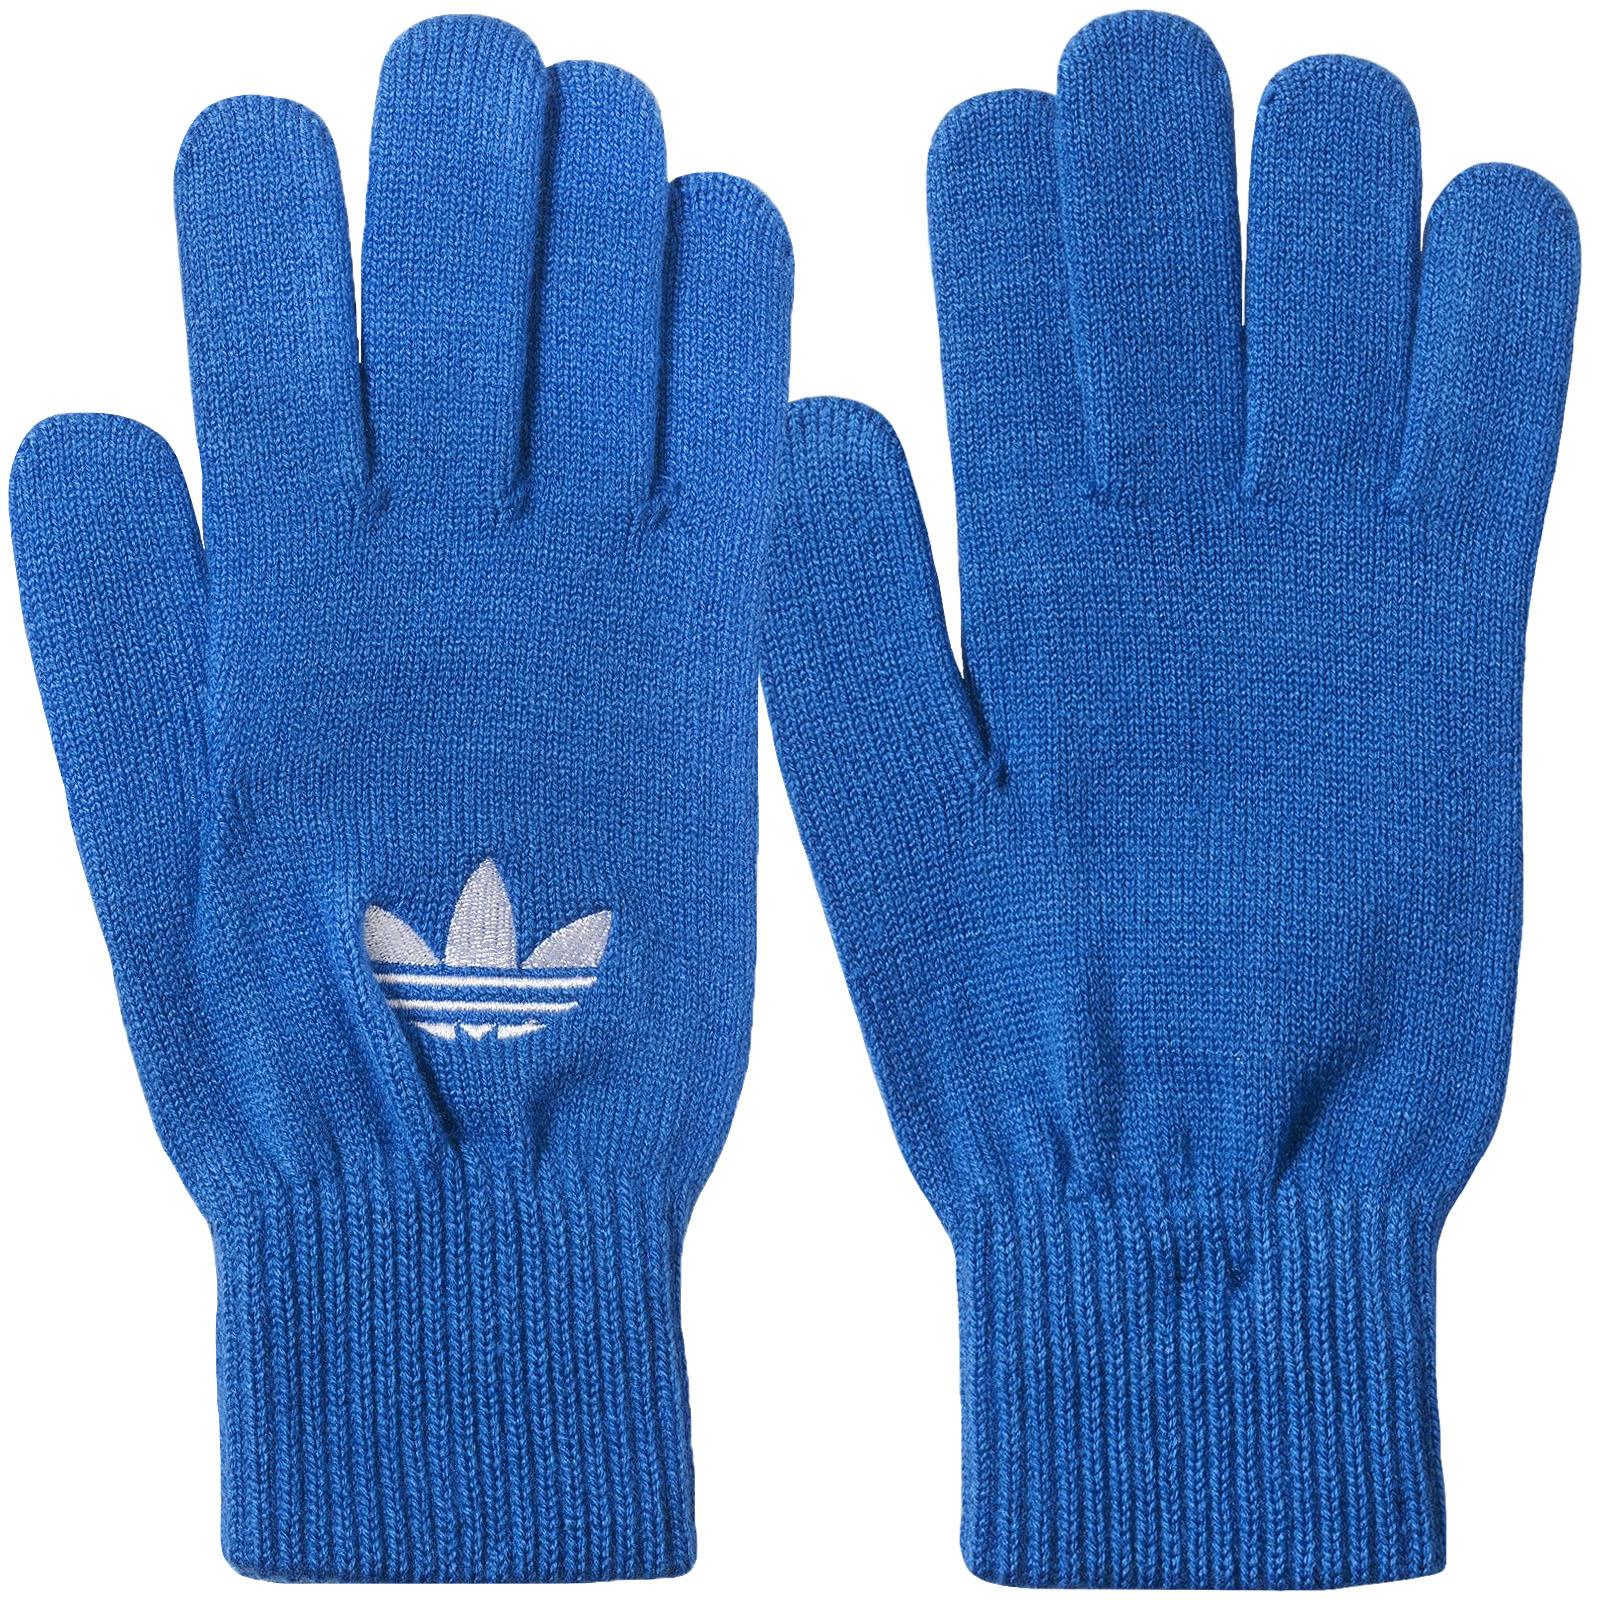 Details about adidas Originals Unisex Warm Winter Stretchy Trefoil Knitted Gloves Blue